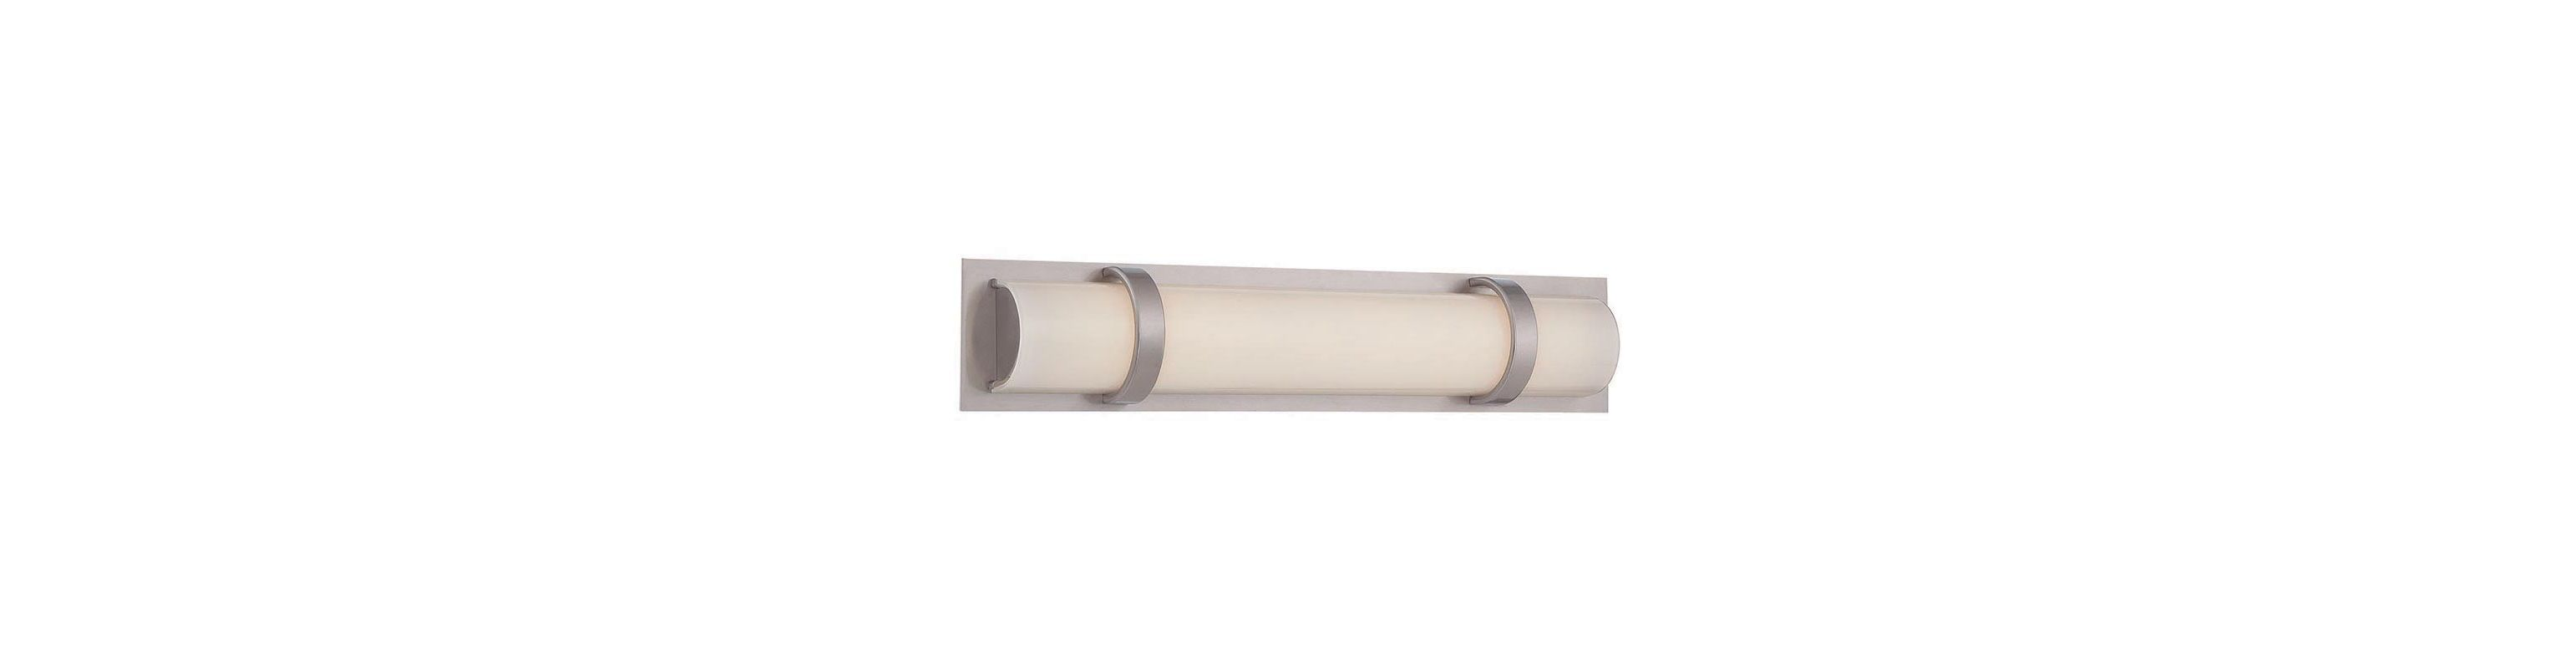 "WAC Lighting WS-6618 Vie 18"" LED Dimming Bathroom Bar Light Brushed Sale $199.00 ITEM#: 2416394 MODEL# :WS-6618-BN UPC#: 790576298917 :"